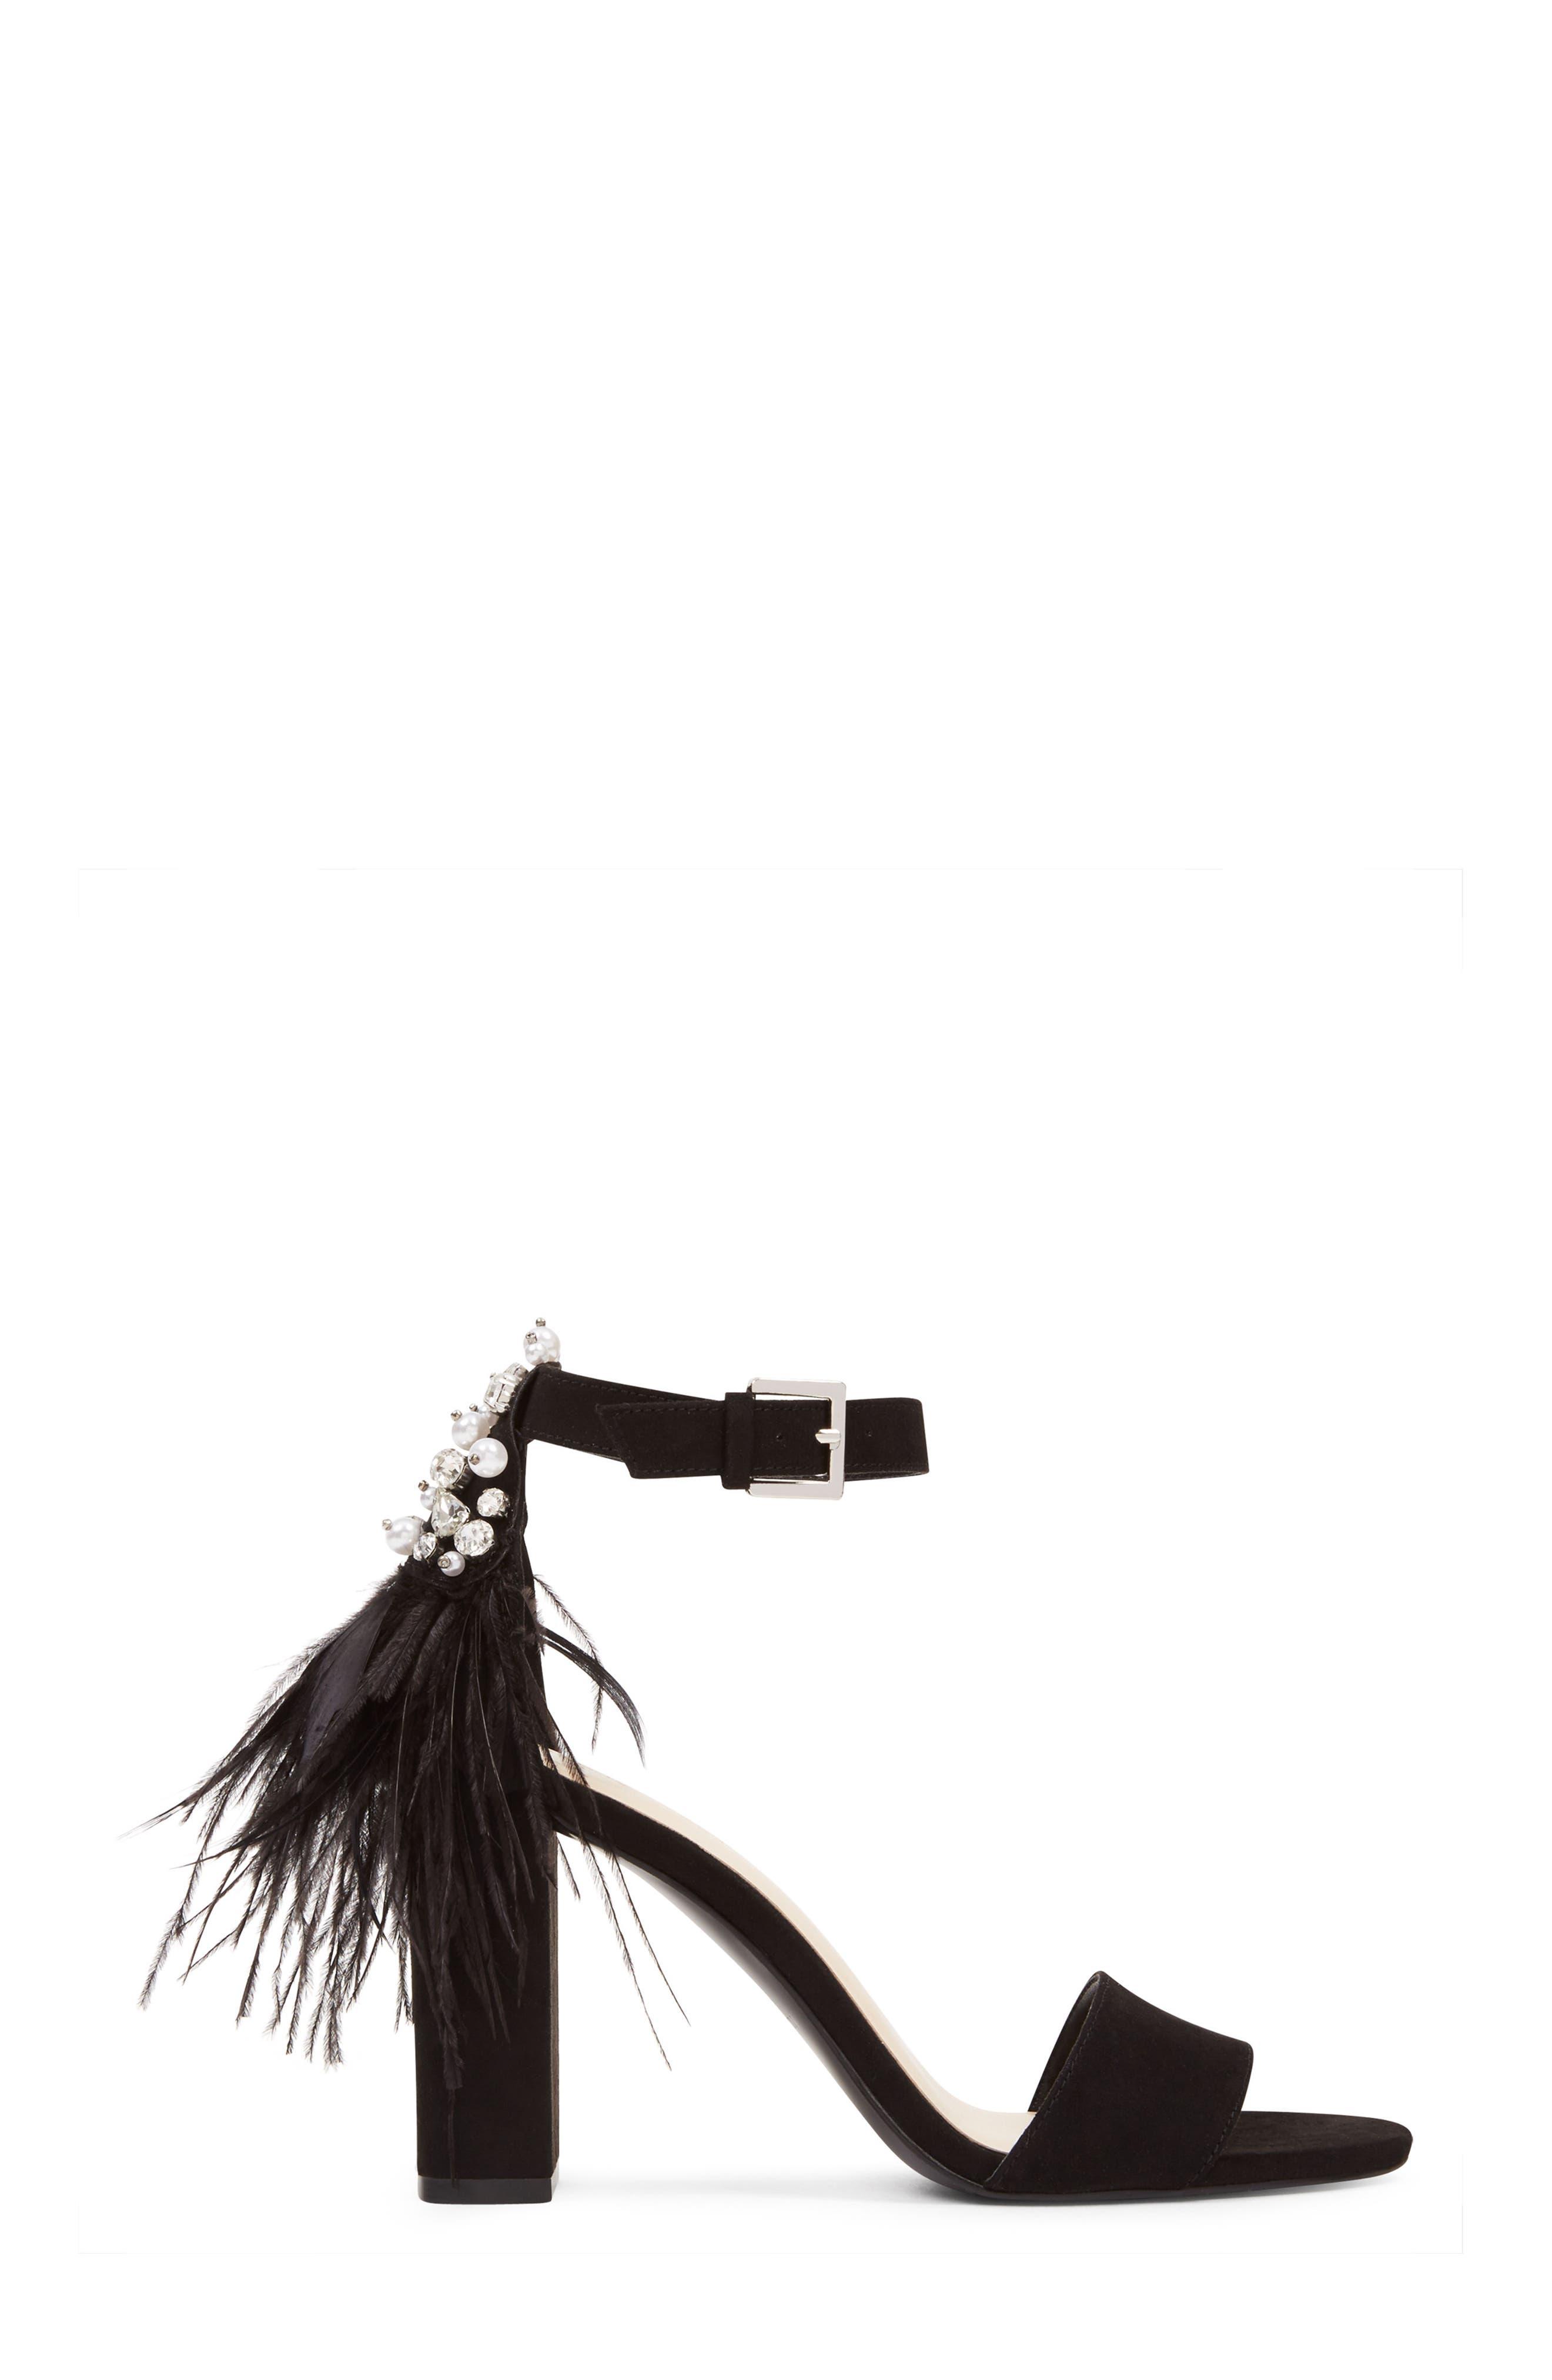 Aaronita Feather Block Heel Sandal,                             Alternate thumbnail 3, color,                             001